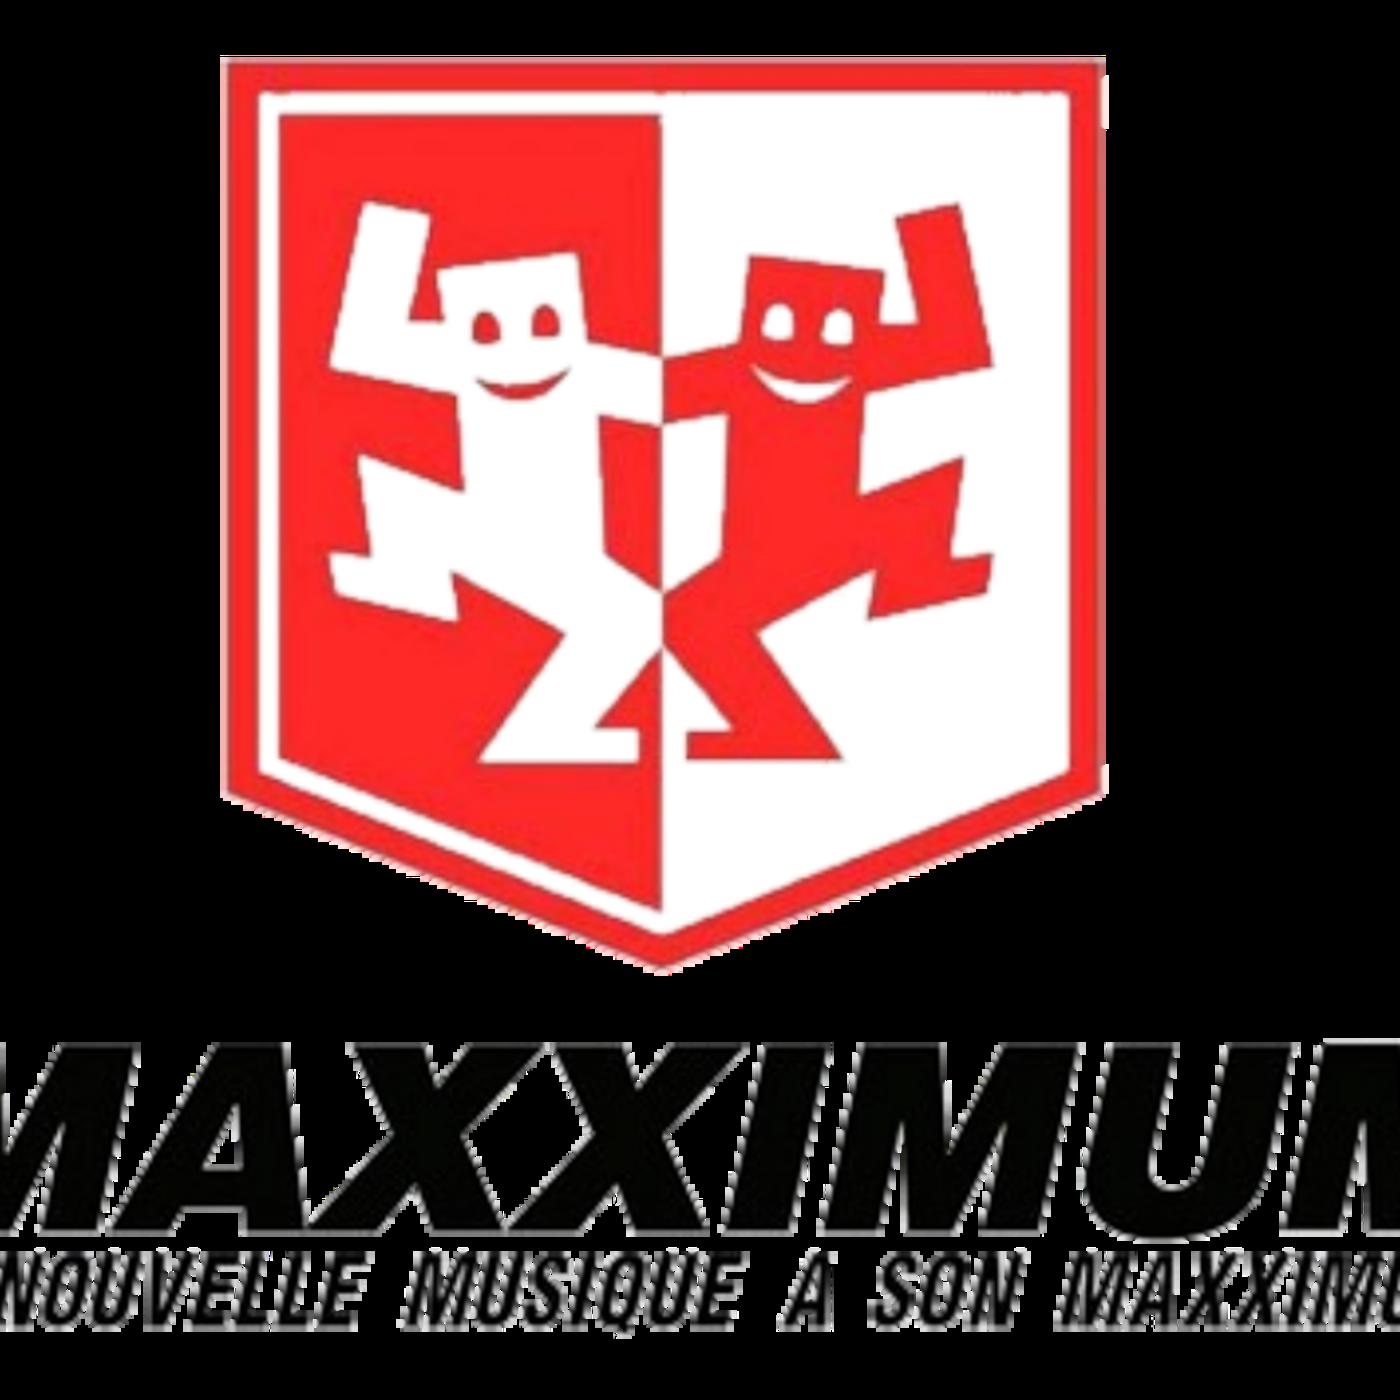 Maxximum vol. 2